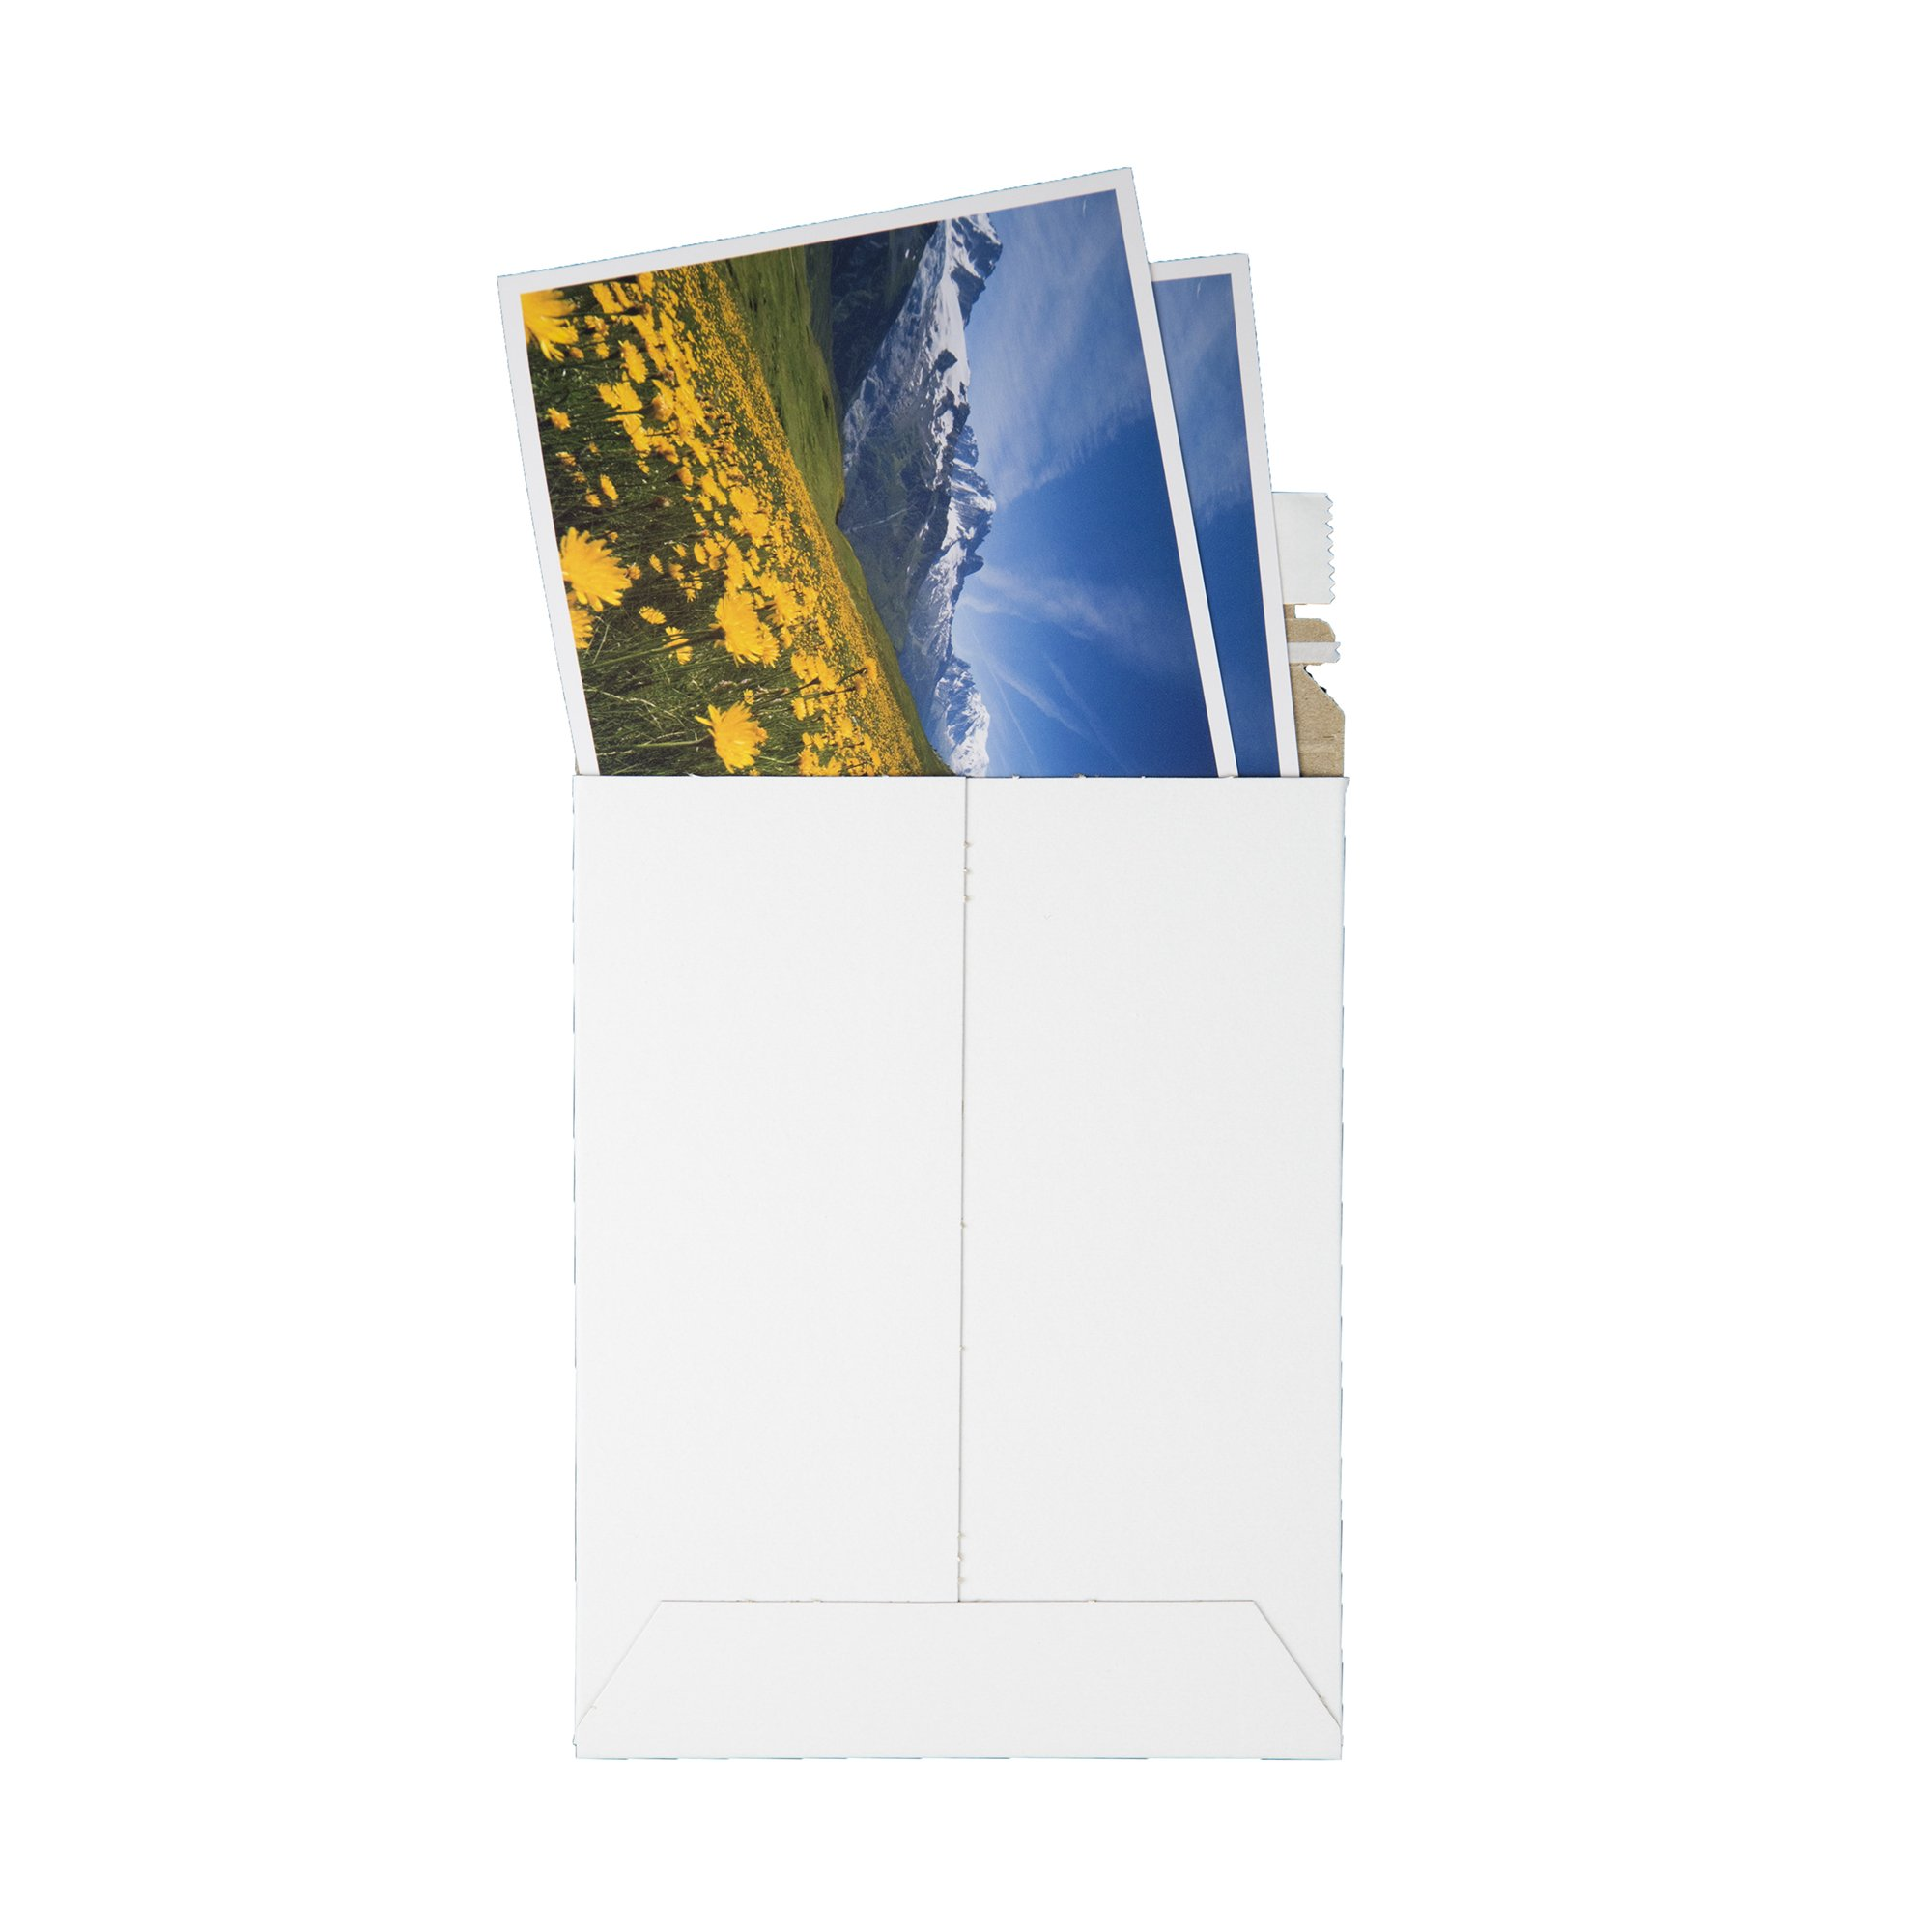 Quality Park Extra-Rigid Fiberboard Photo Document Mailers, Redi-Strip, White, 12.75x15, 25 per box (64019) by Quality Park (Image #4)